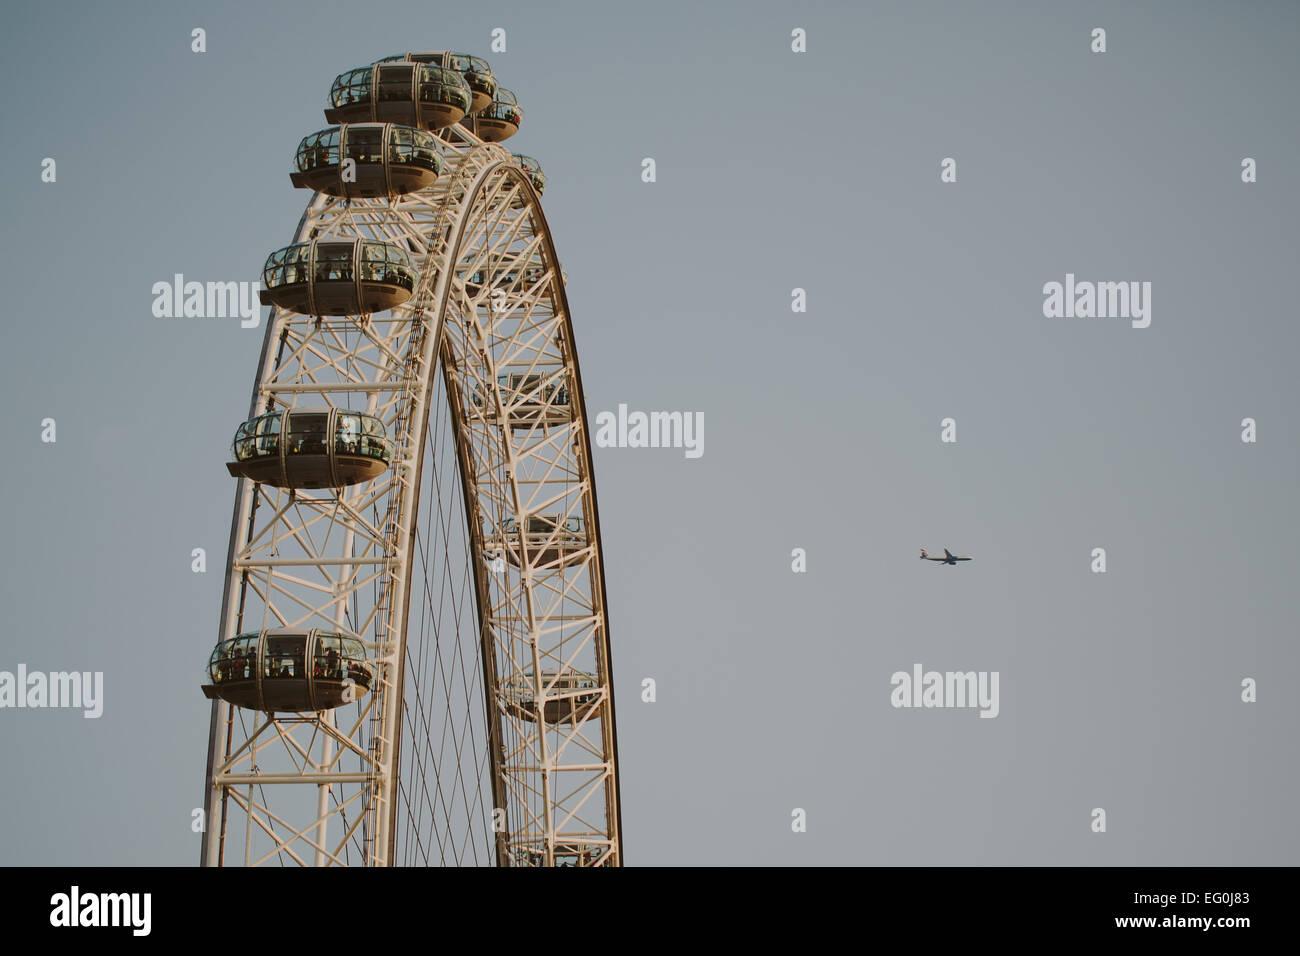 UK, London, Millenium Wheel Stock Photo